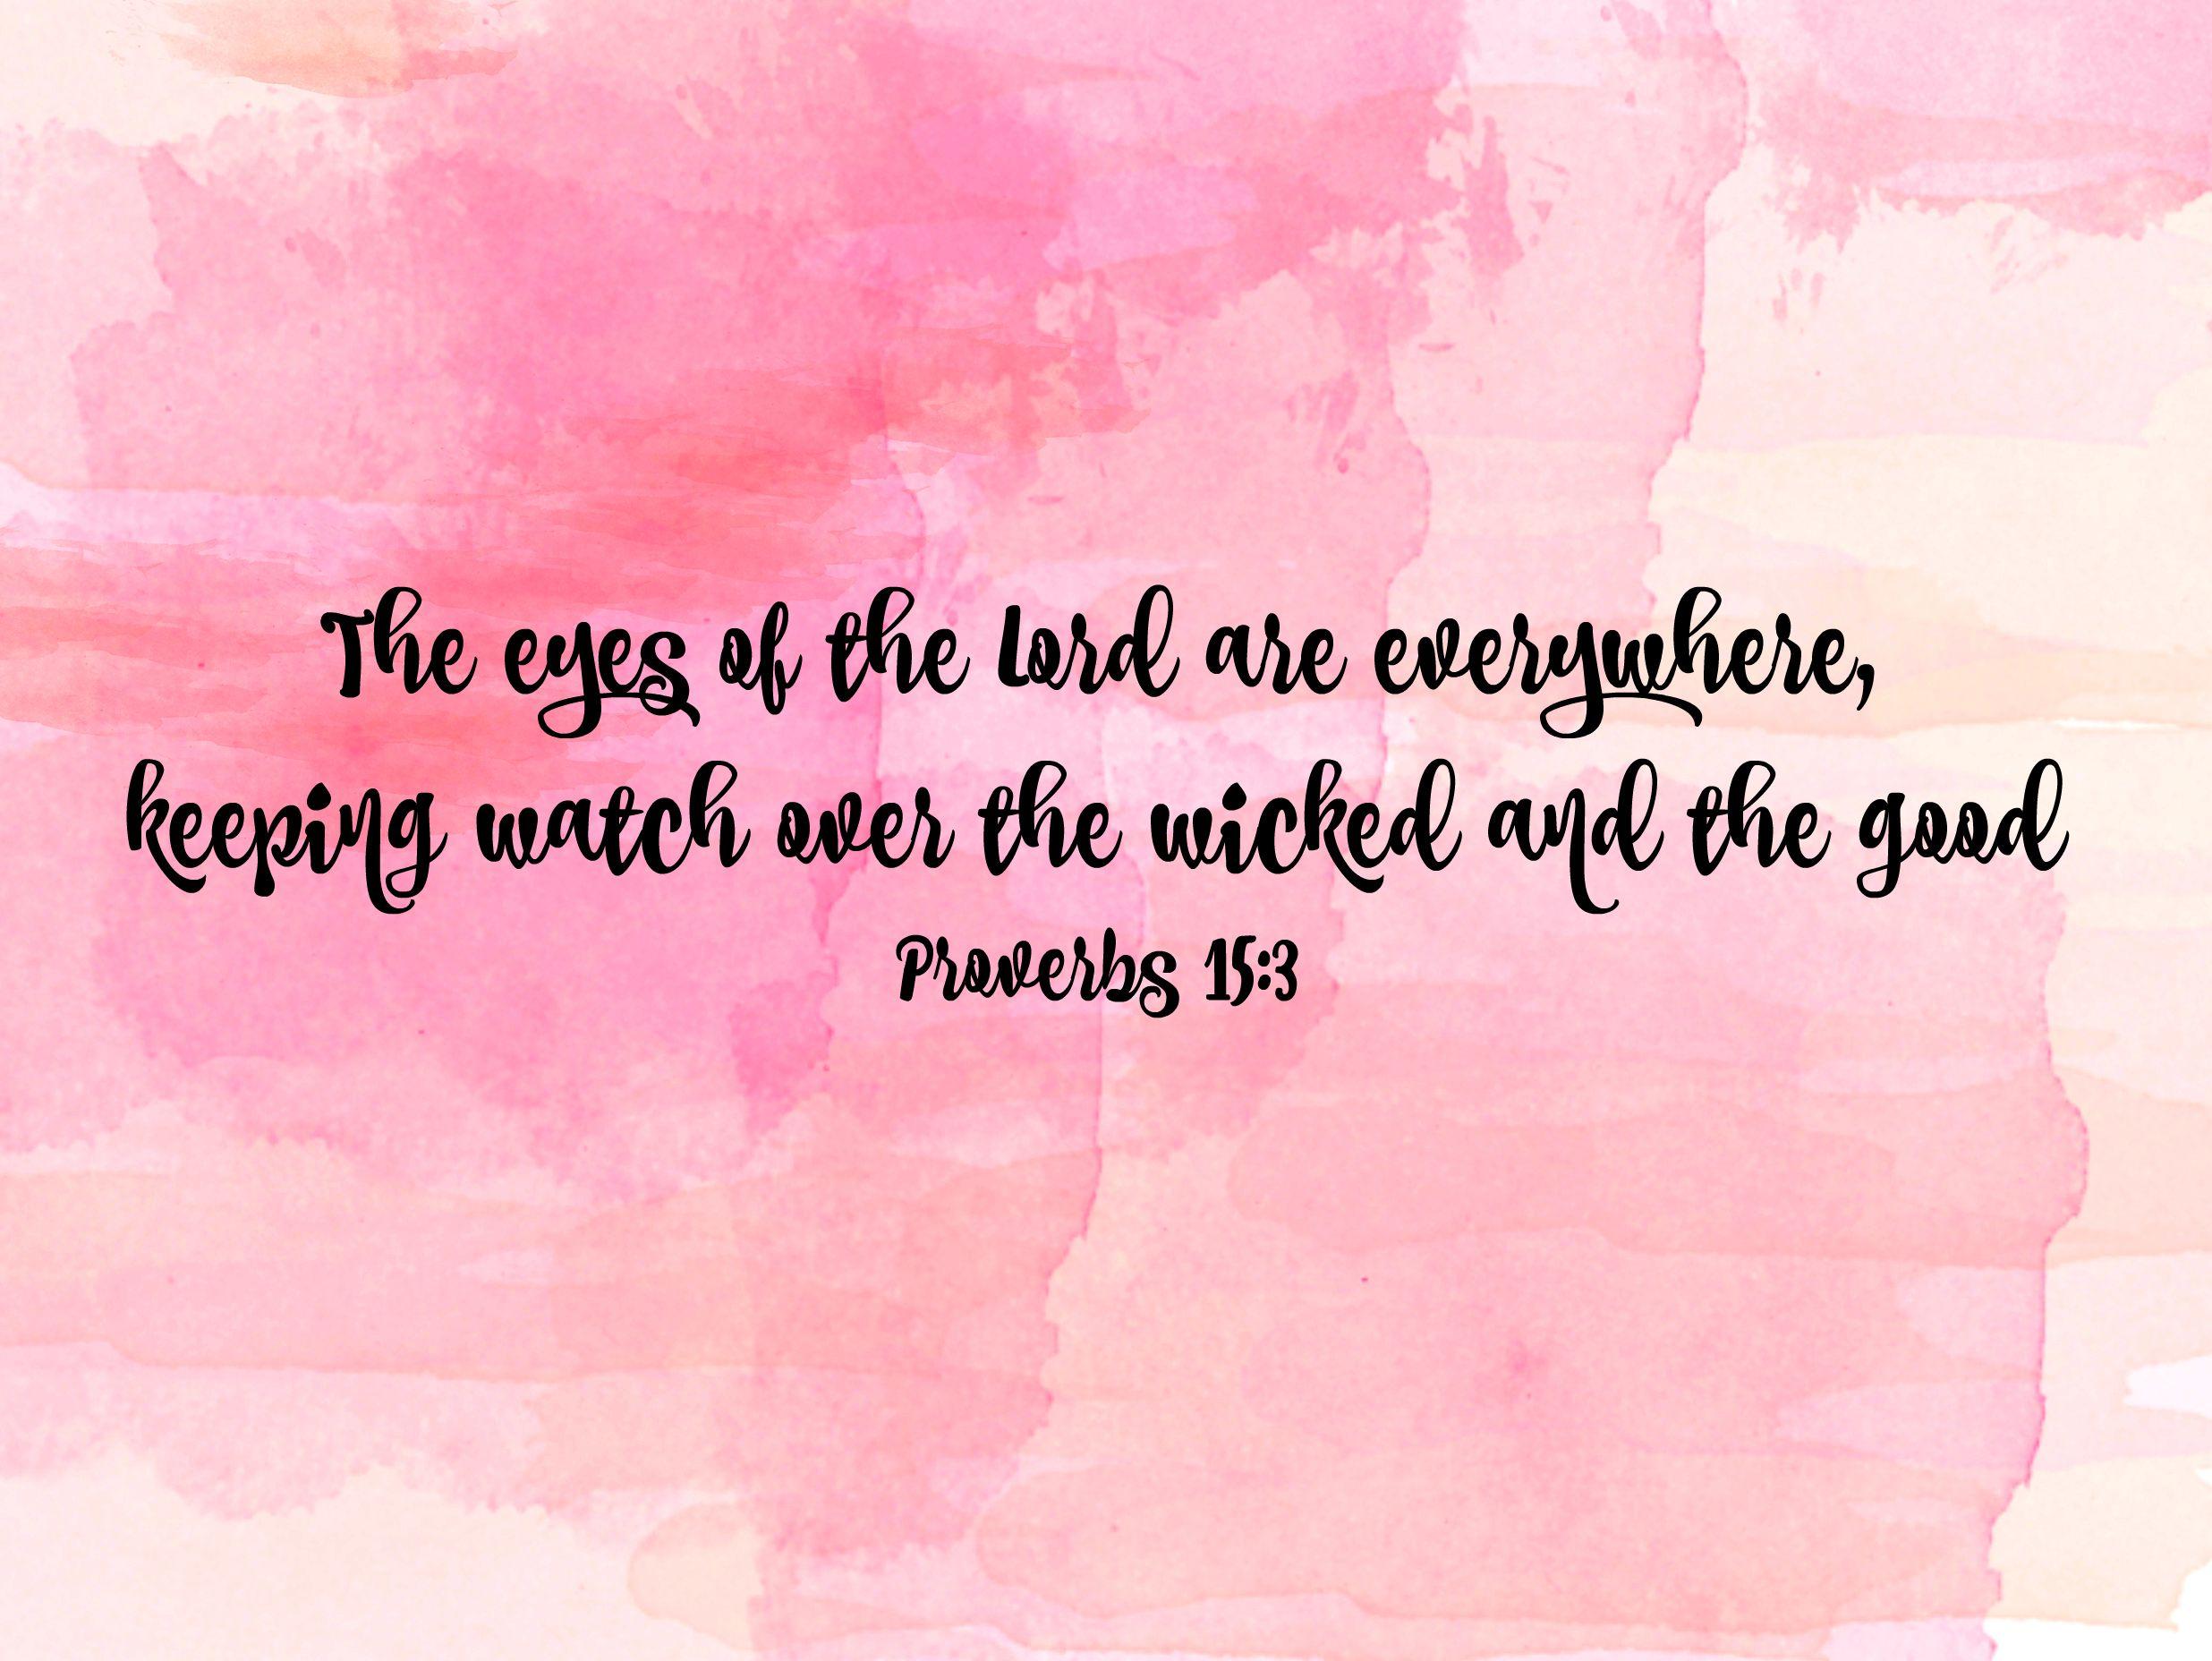 Proverbs 15 3 Bible Quote Pink Watercolor Desktop Background